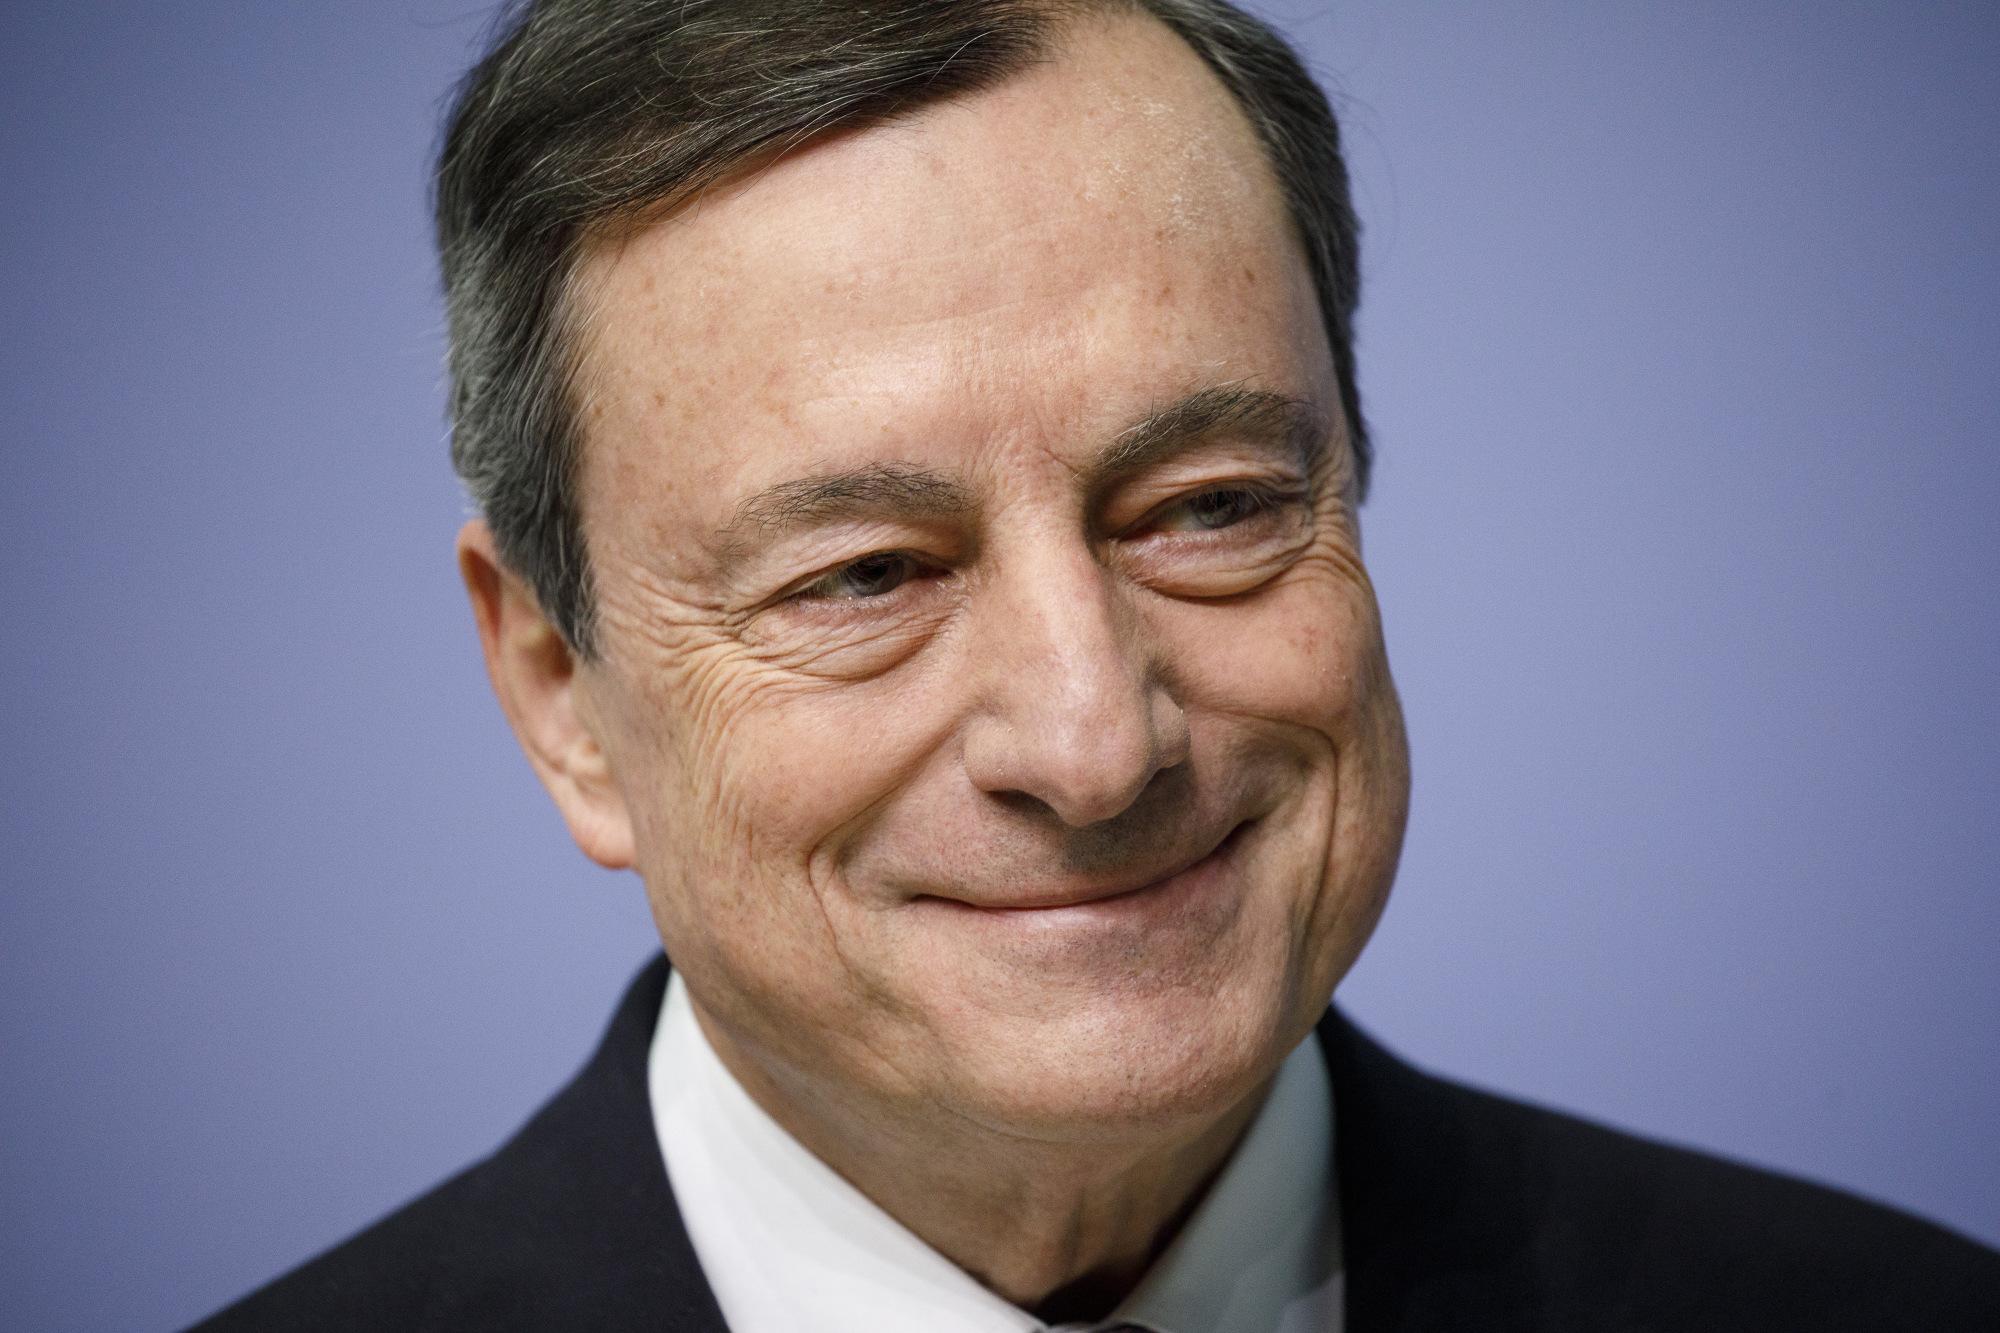 bloomberg.com - Piotr Skolimowski - Draghi Will Just About Raise ECB Interest Rate Before Retiring